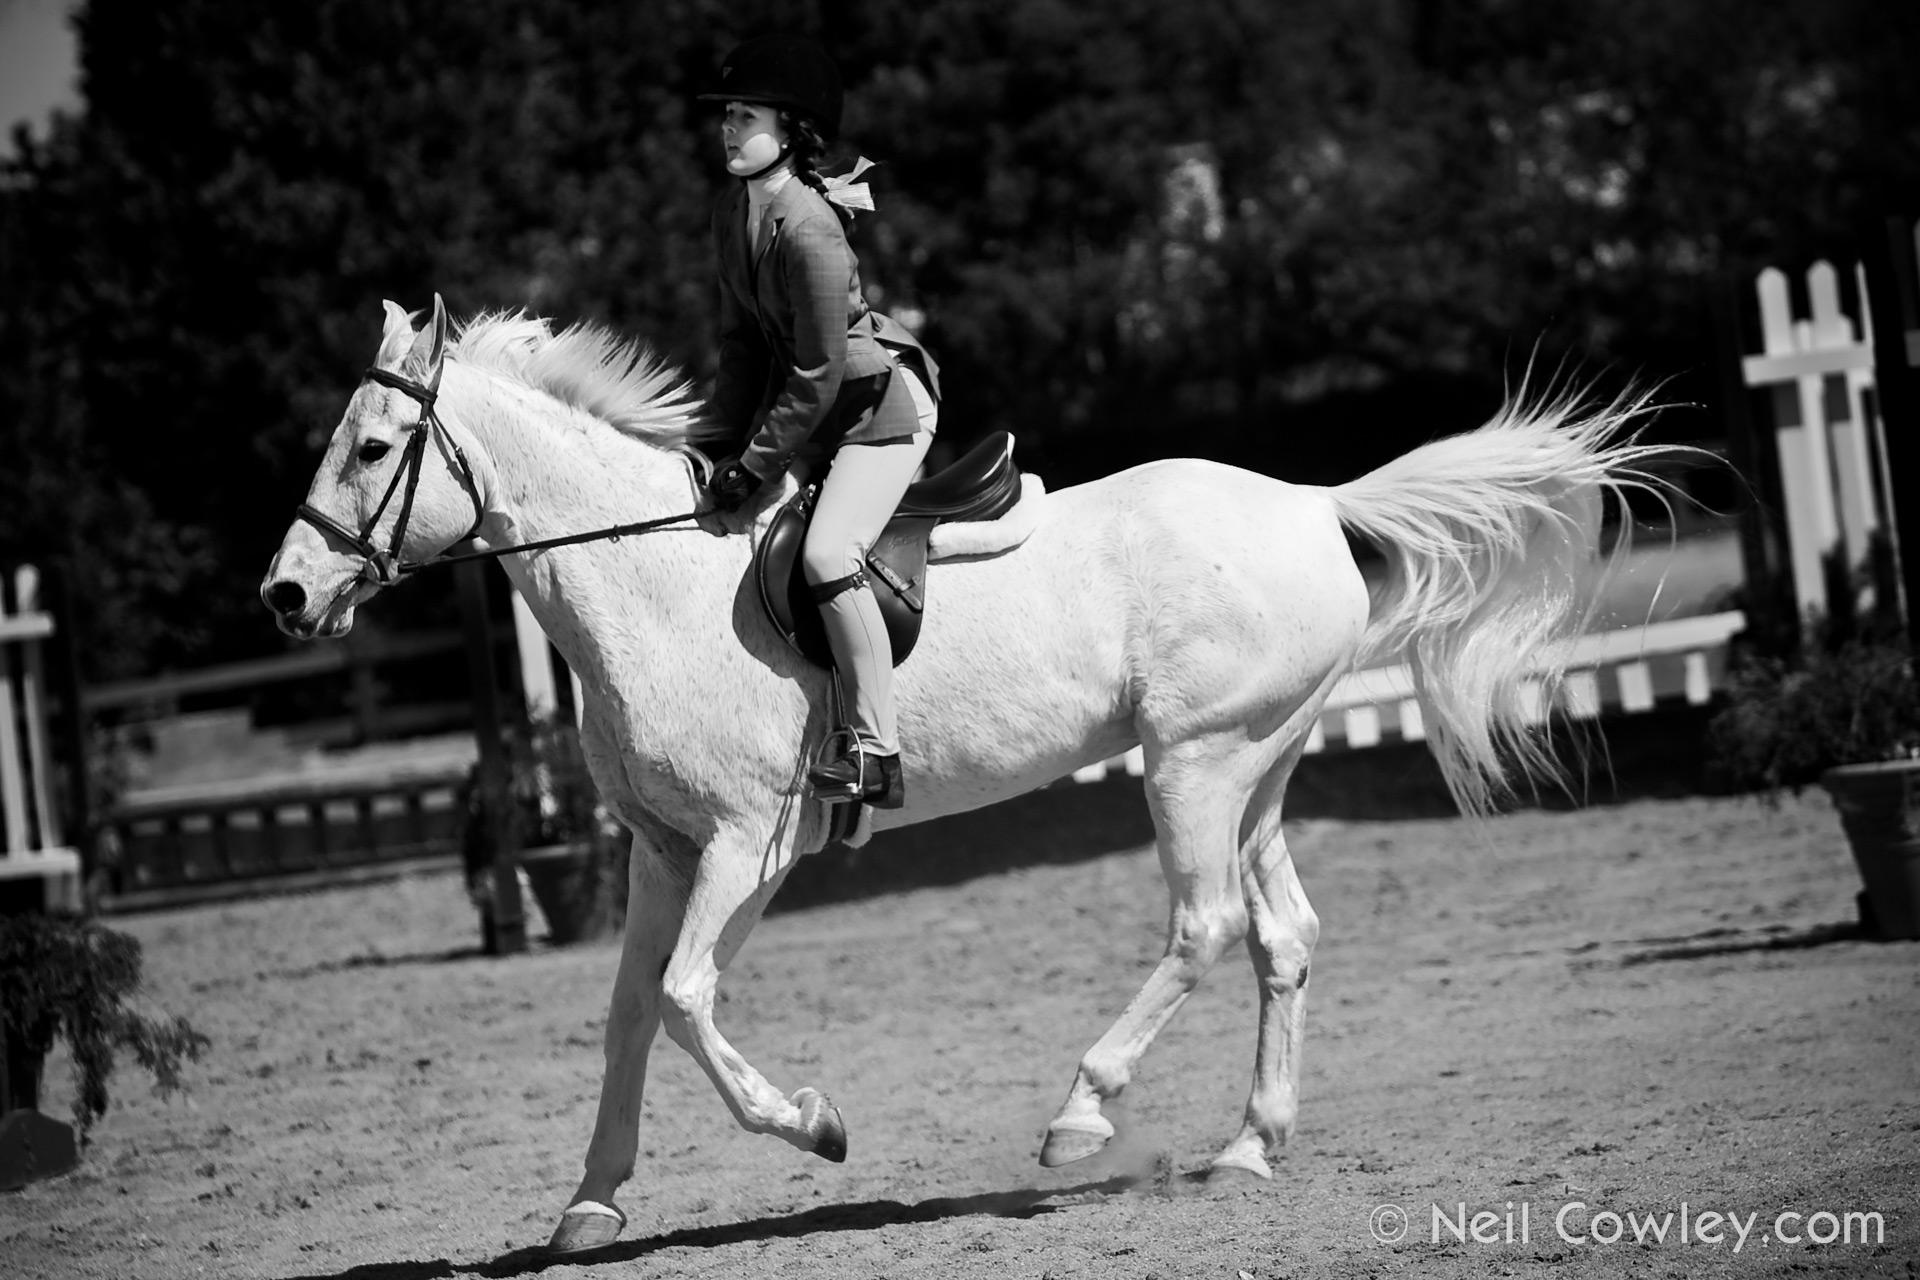 peoria-commercial-photographer-0126